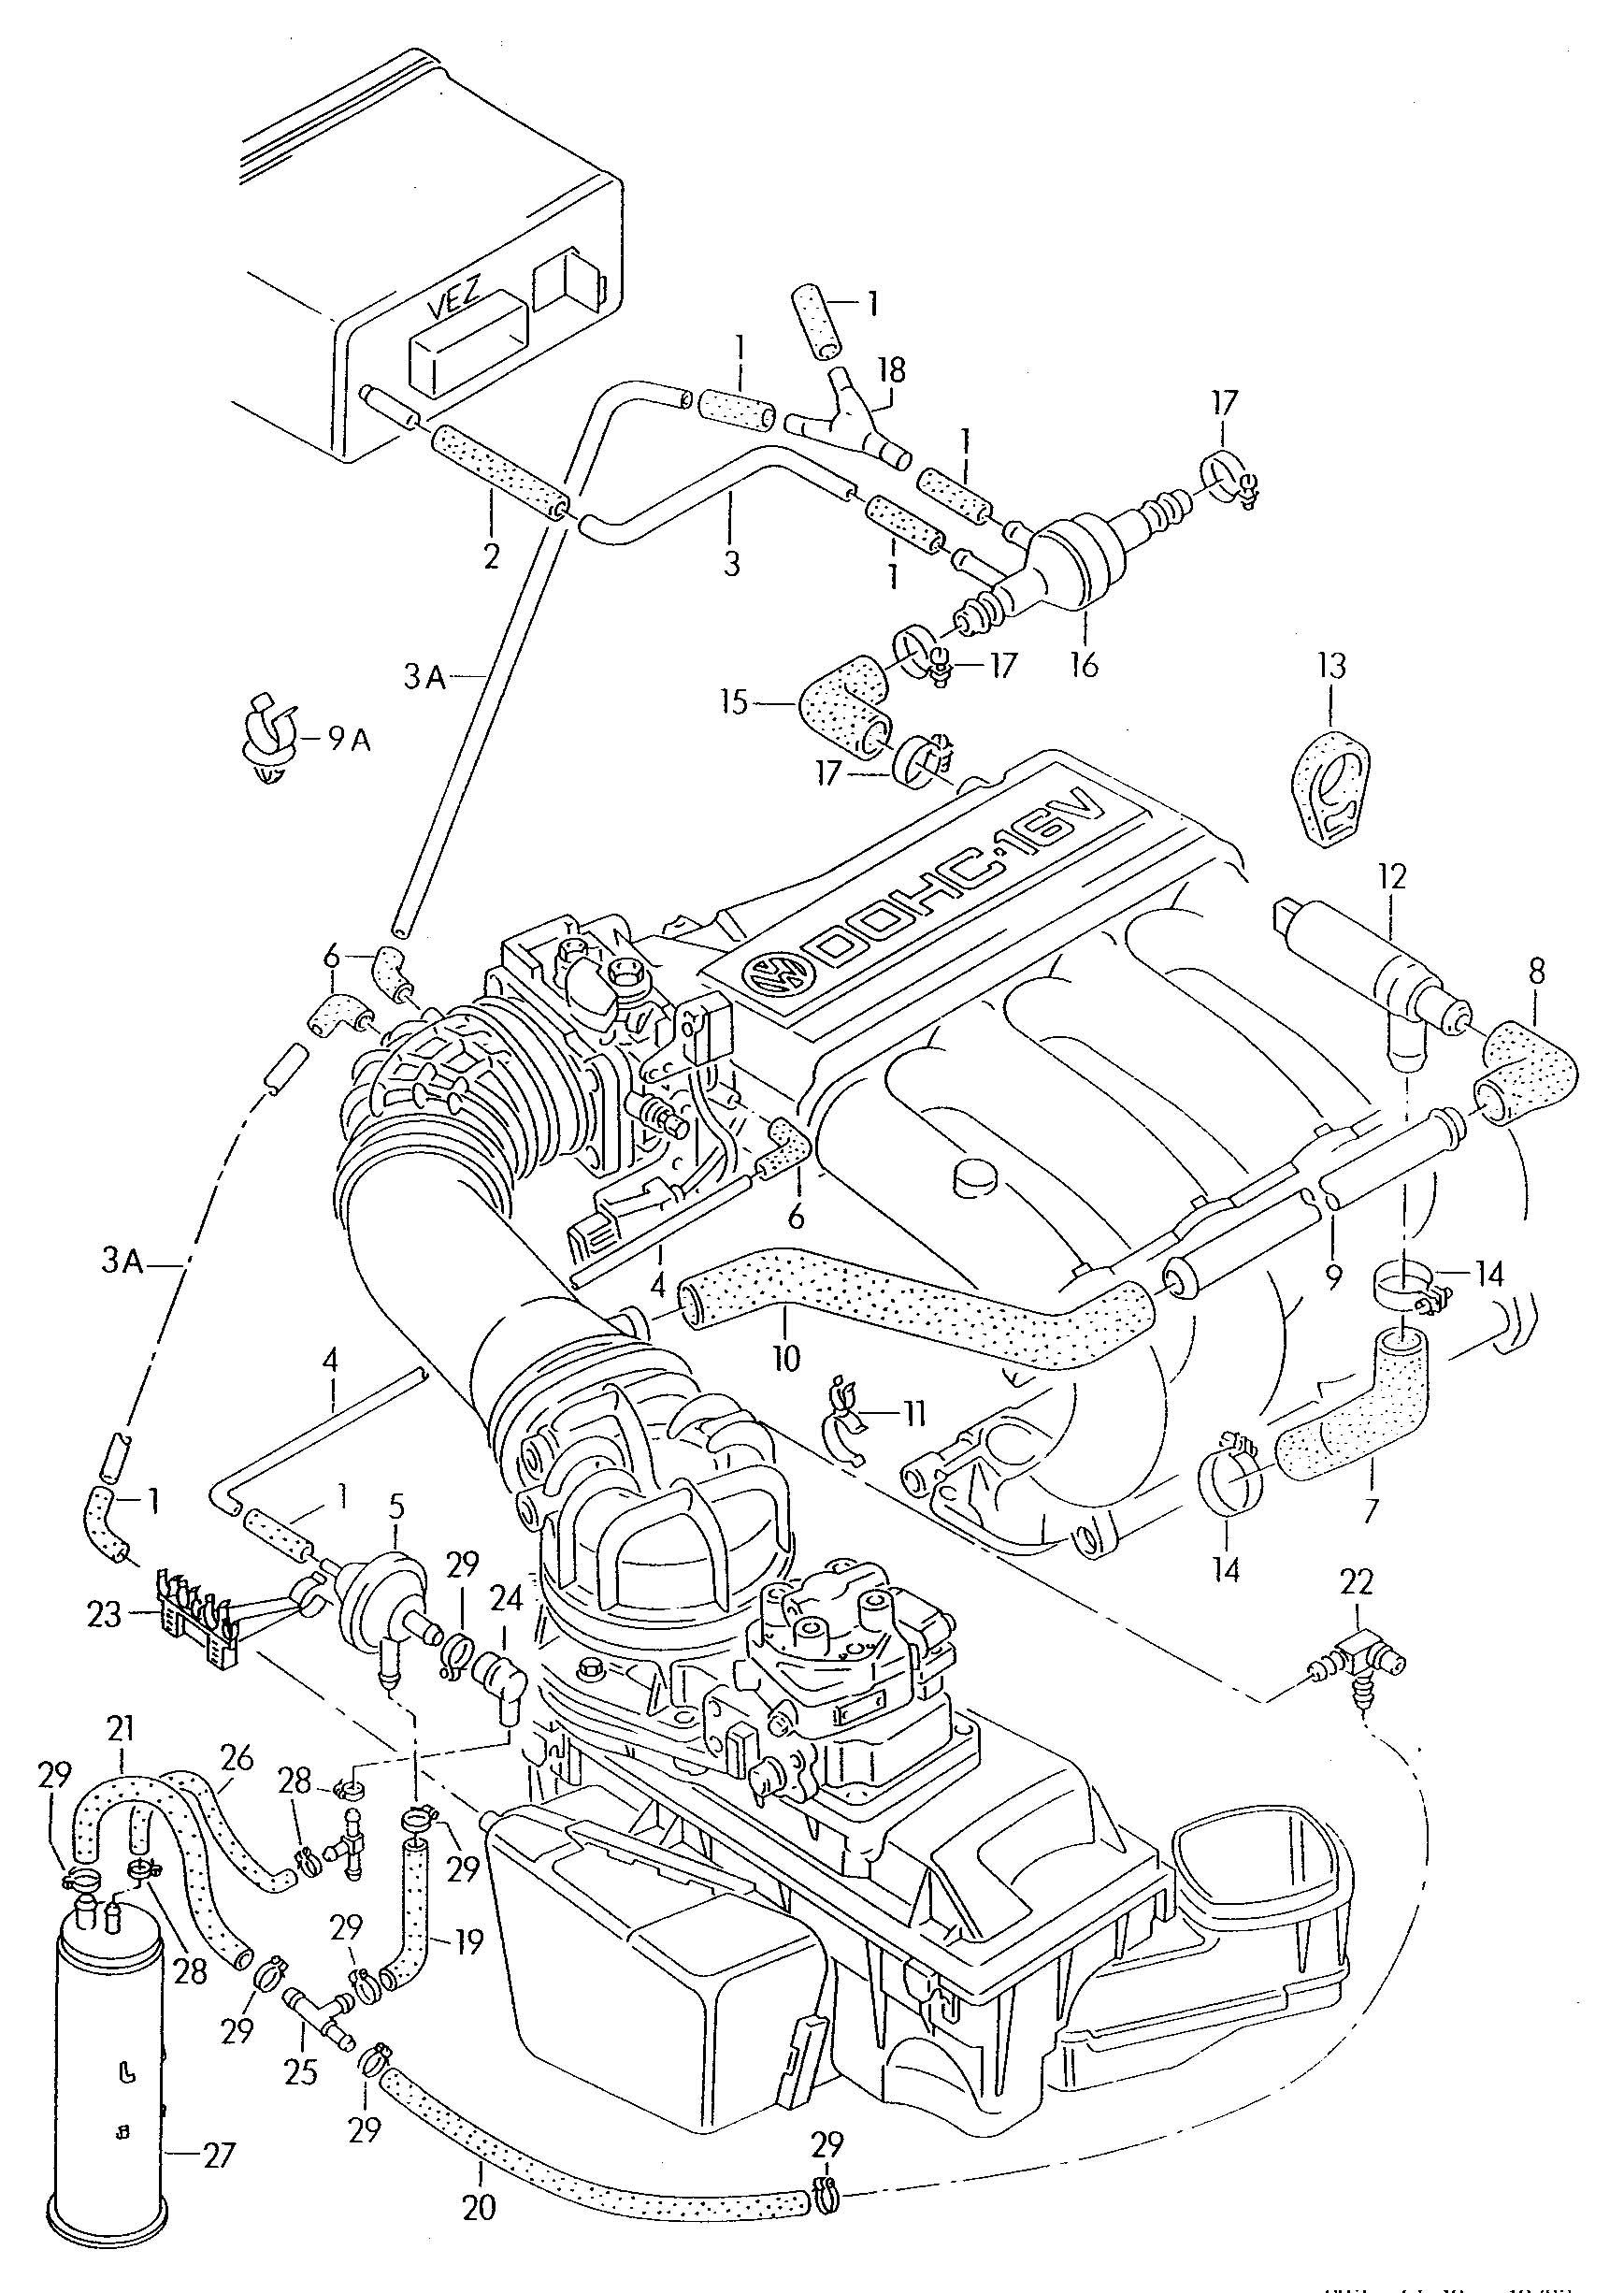 Pontiac montana front suspension diagram besides repairguidecontent in addition 1971 vw karmann ghia wiring diagram as